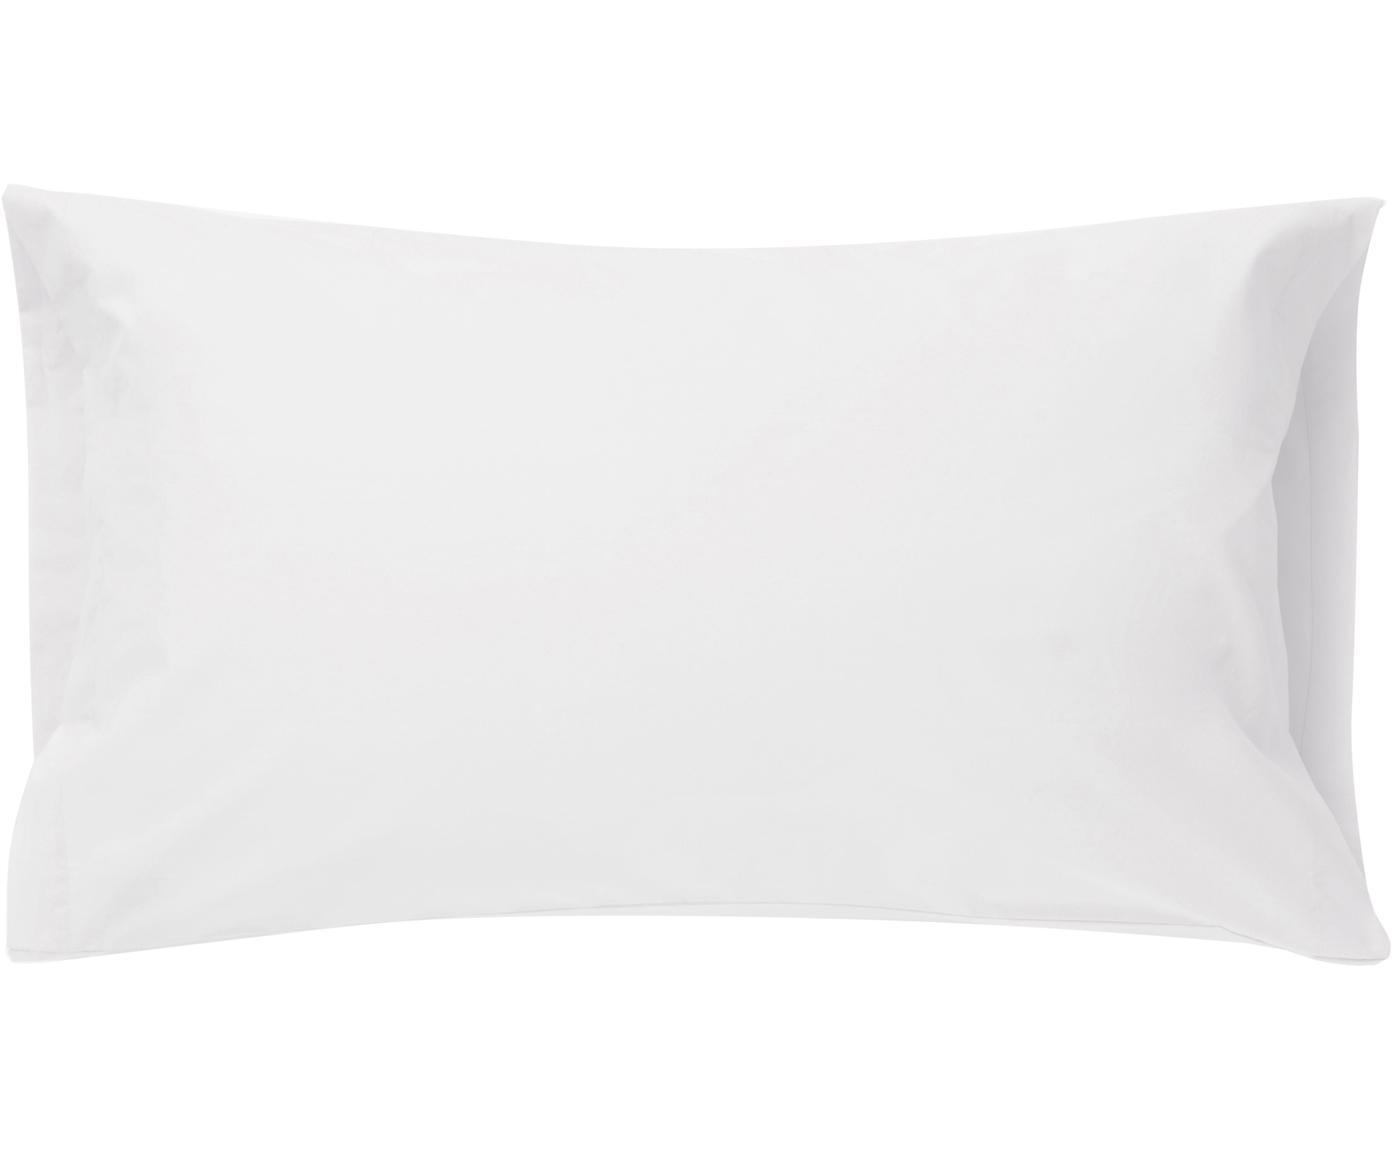 Funda de almohada Plain Dye, Algodón, Blanco, An 50 x L 110 cm